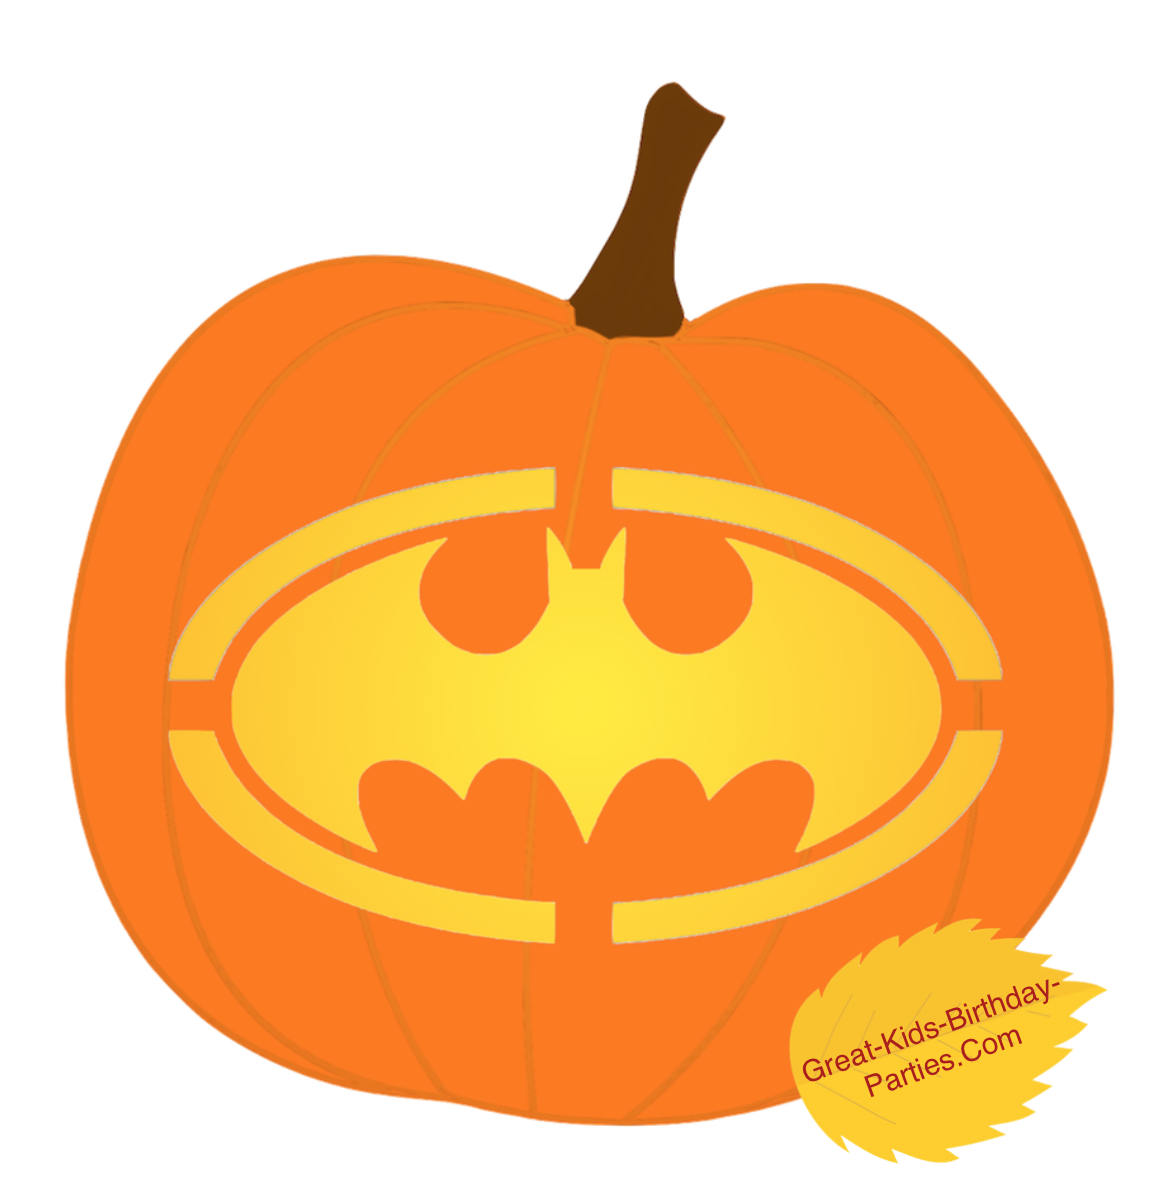 pumpkin stencils-fun halloween pumpkin stencils for kids. easy